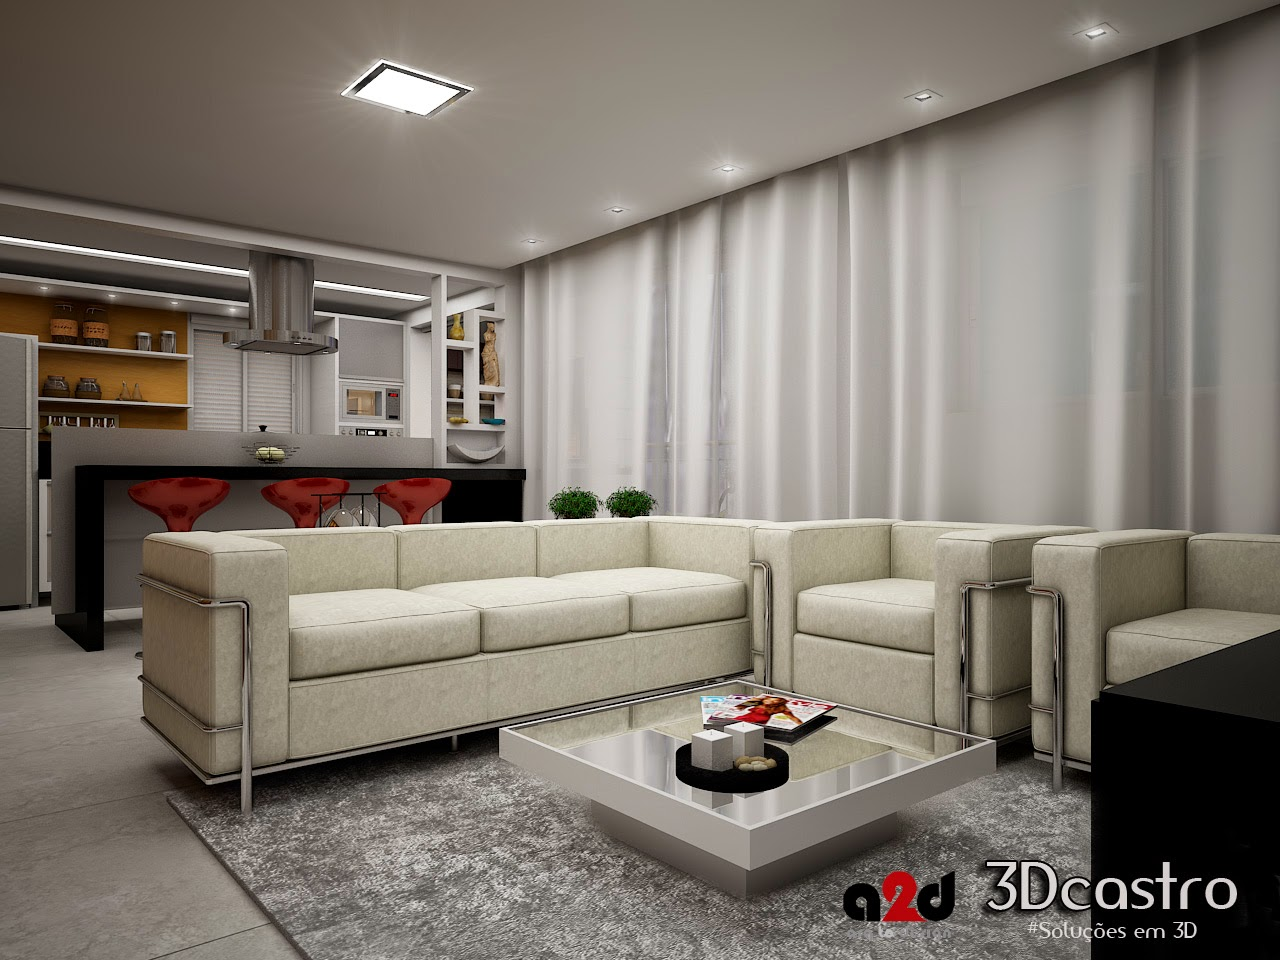 projeto de sala de estar e planta humanizada 3dcastro On planta de sala de estar 3d